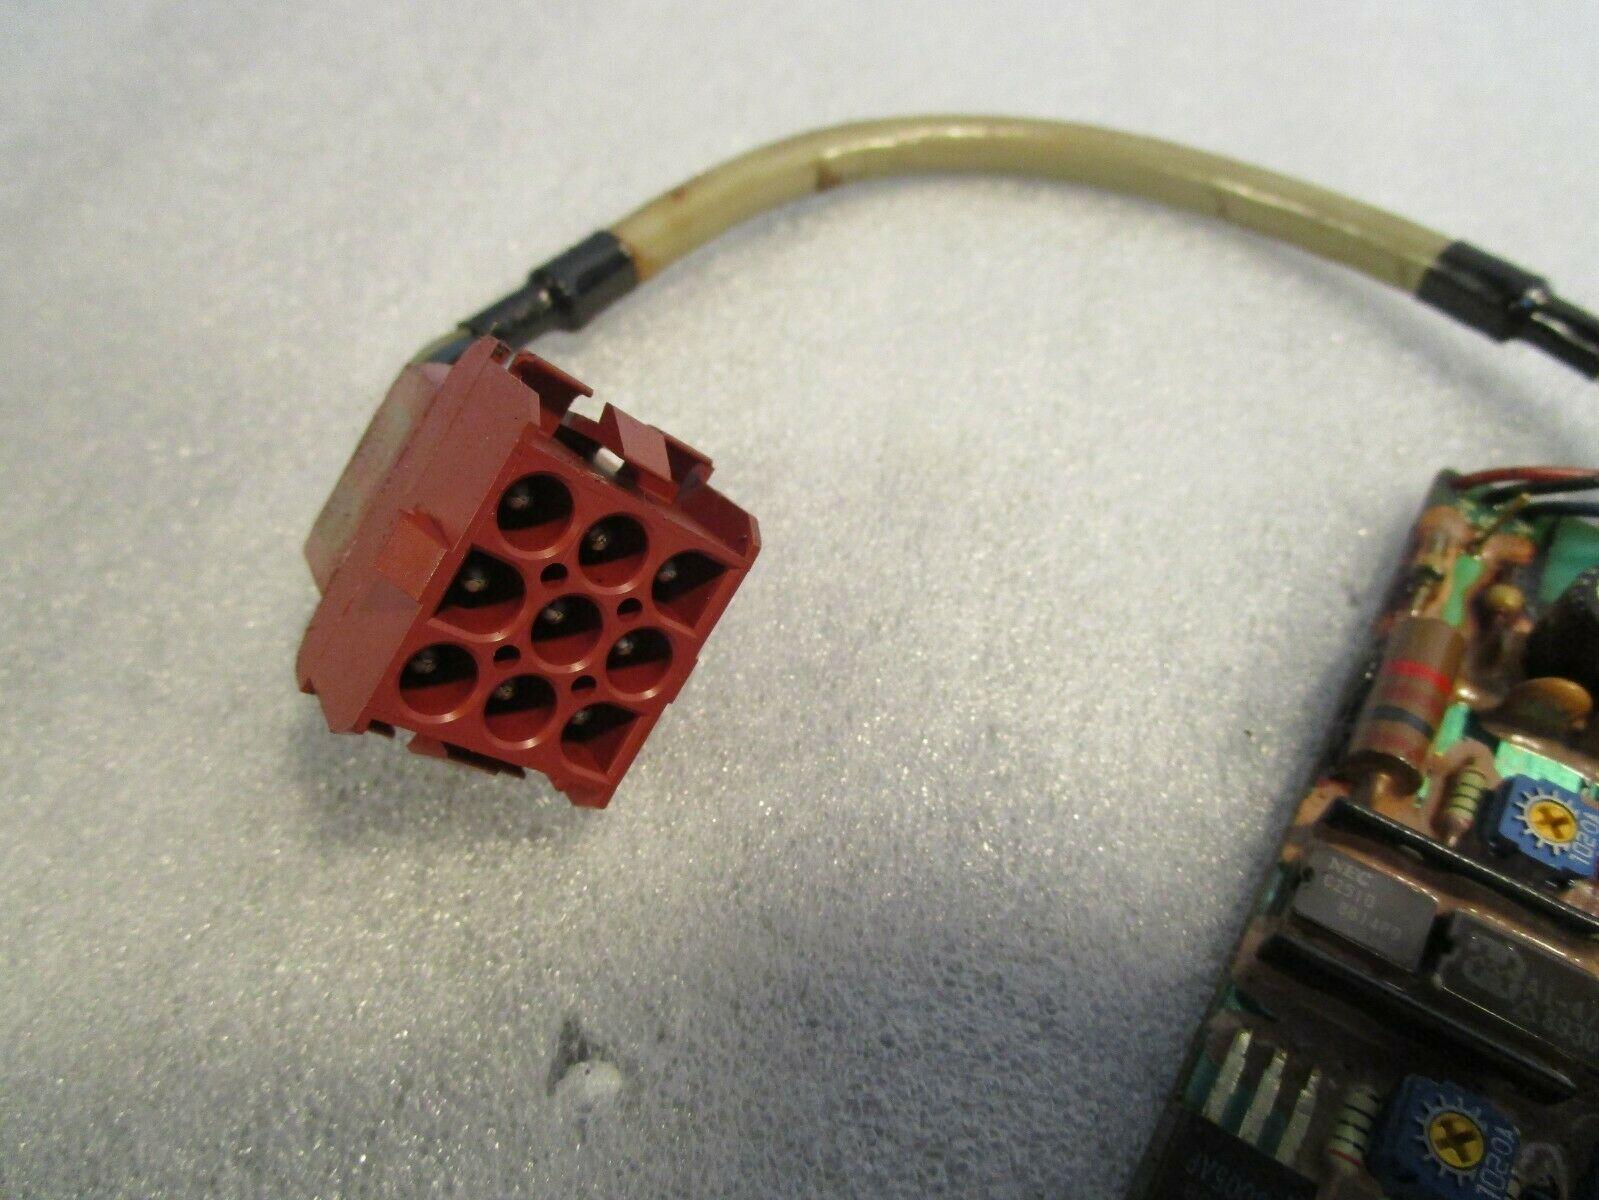 Mazak Mitsubishi Jamagawa Spindle Adjustment Encoder Control Board 6590-608